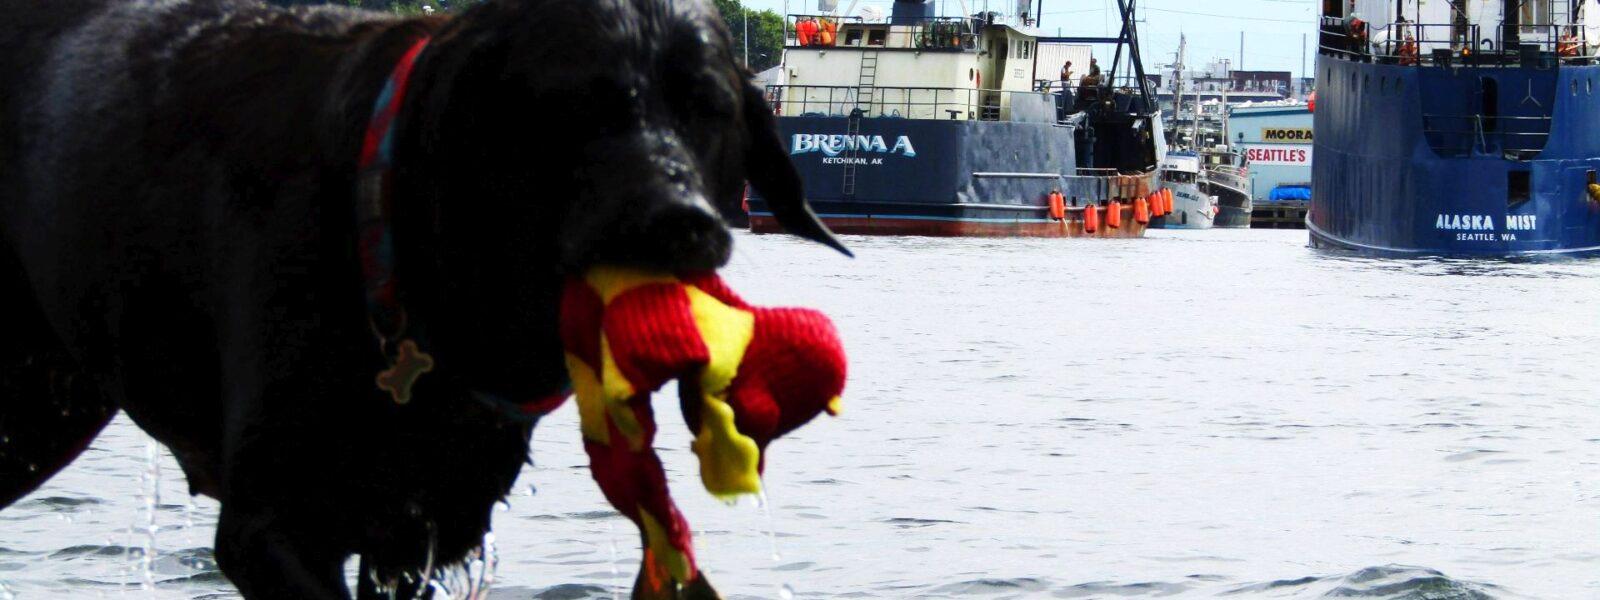 Seattle Easter Boat Parade, Lake Union, WA, SYC, Opening Day Boating, NW Yachting, Salty Dog Boating